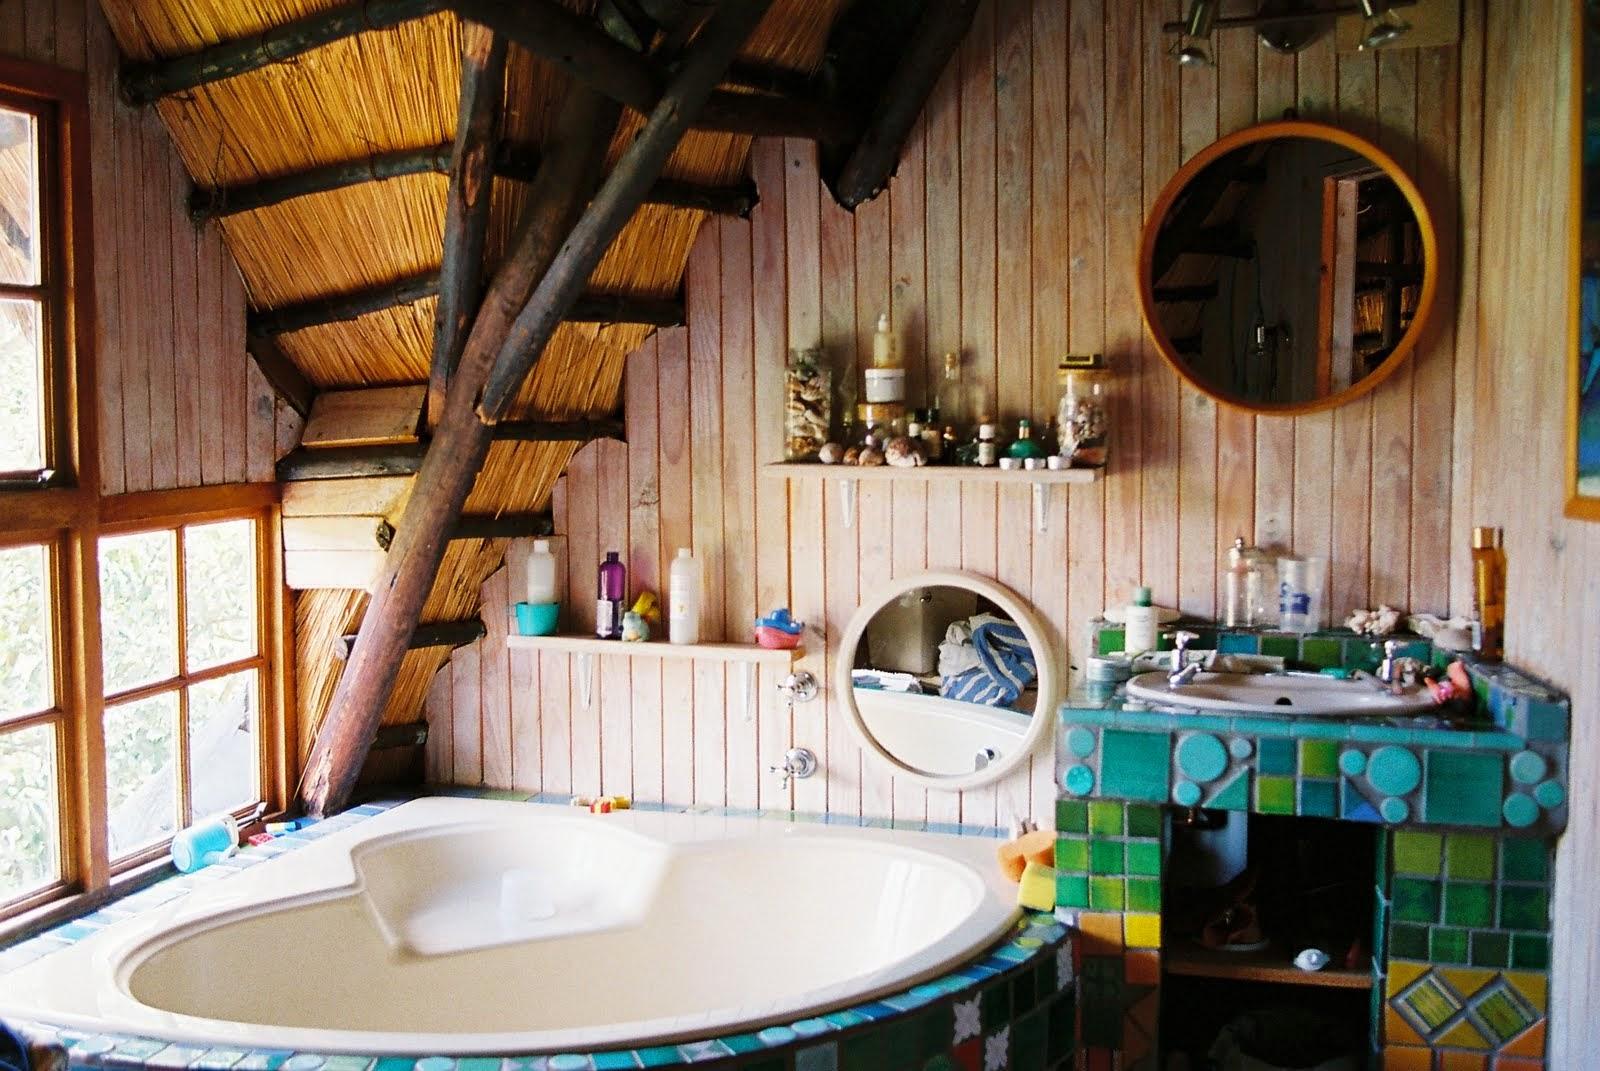 moon to moon bohemian summer bathroom inspiration. Black Bedroom Furniture Sets. Home Design Ideas